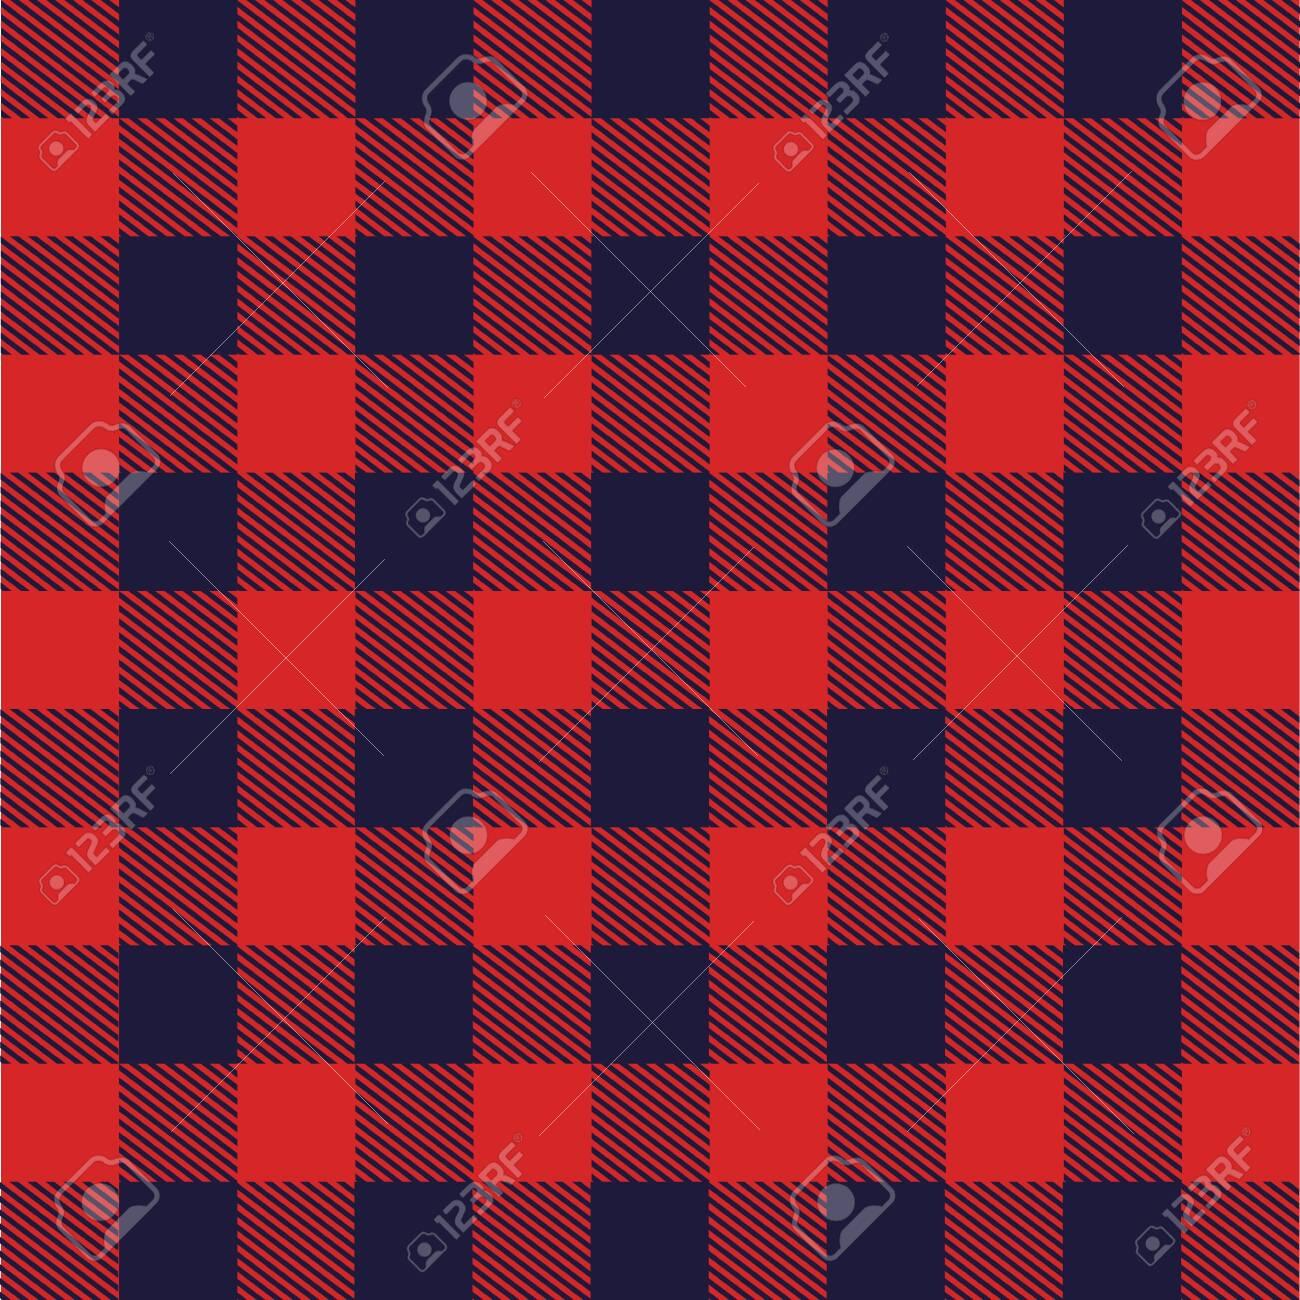 fabric with Scottish grid vector illustration design - 98596055